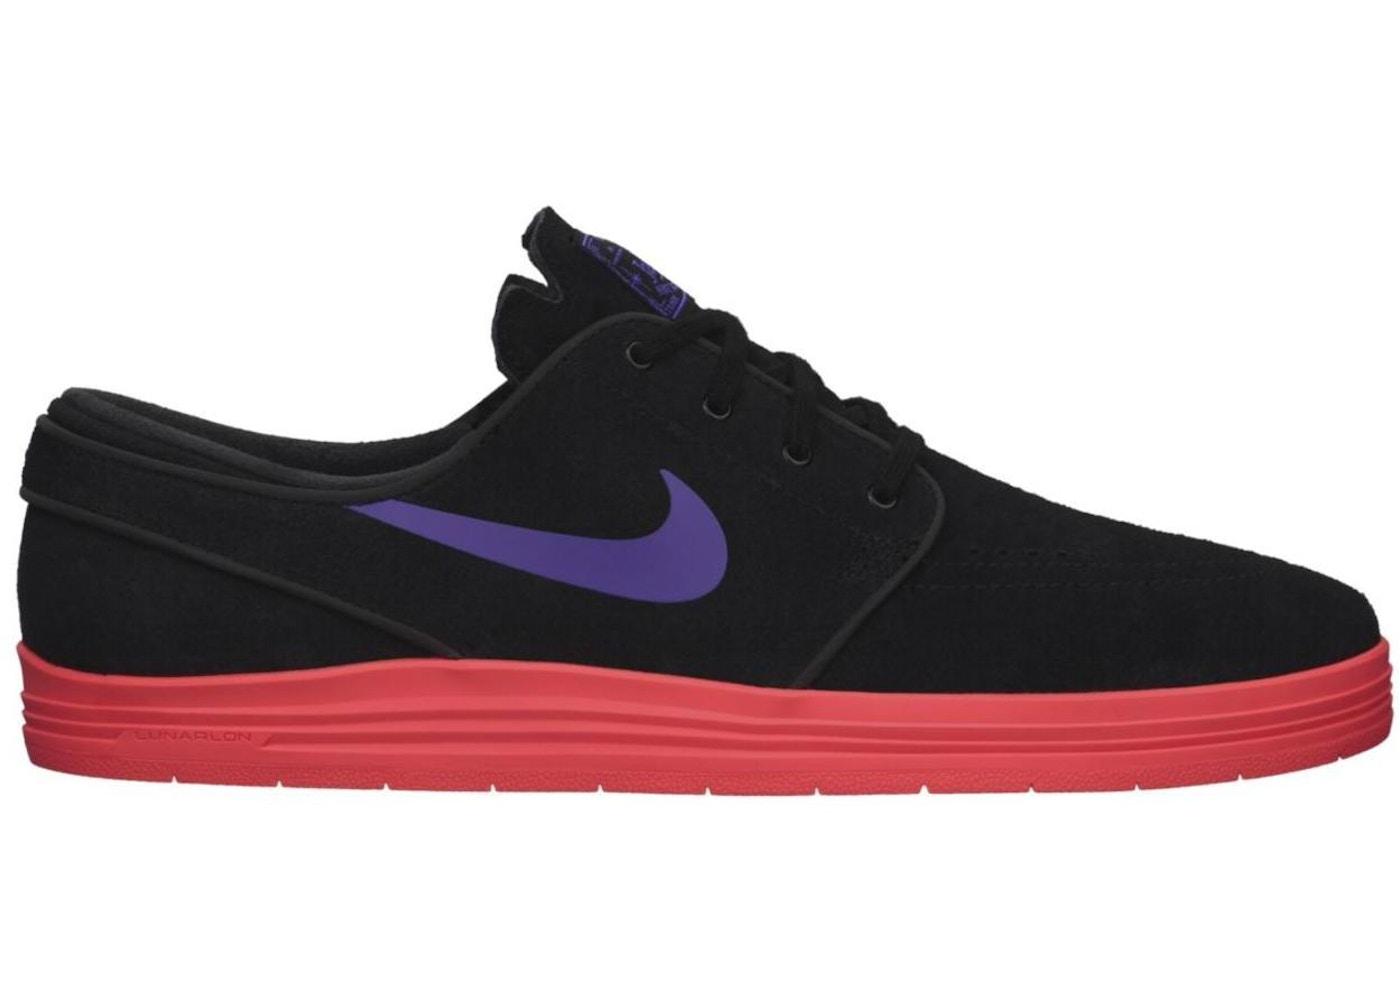 san francisco 5468d a81aa Nike SB Shoes - New Highest Bids